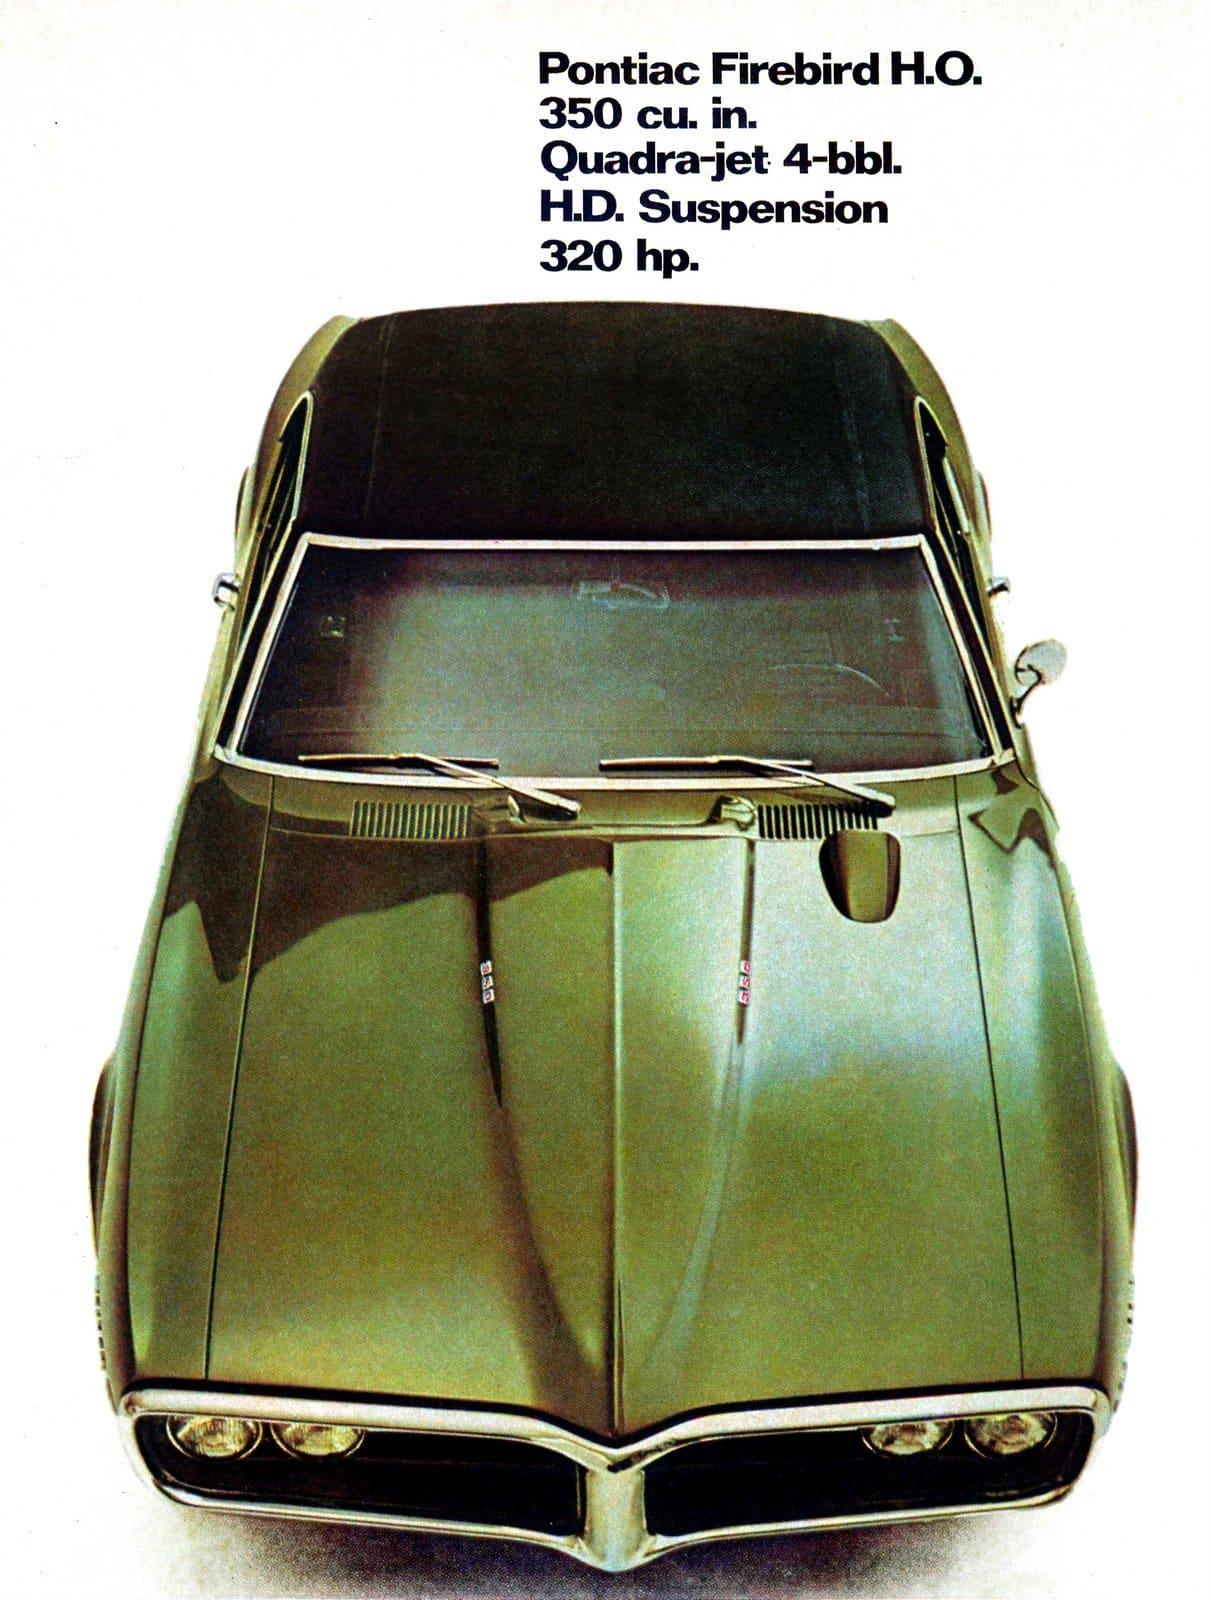 Pontiac Firebird HO from 1968